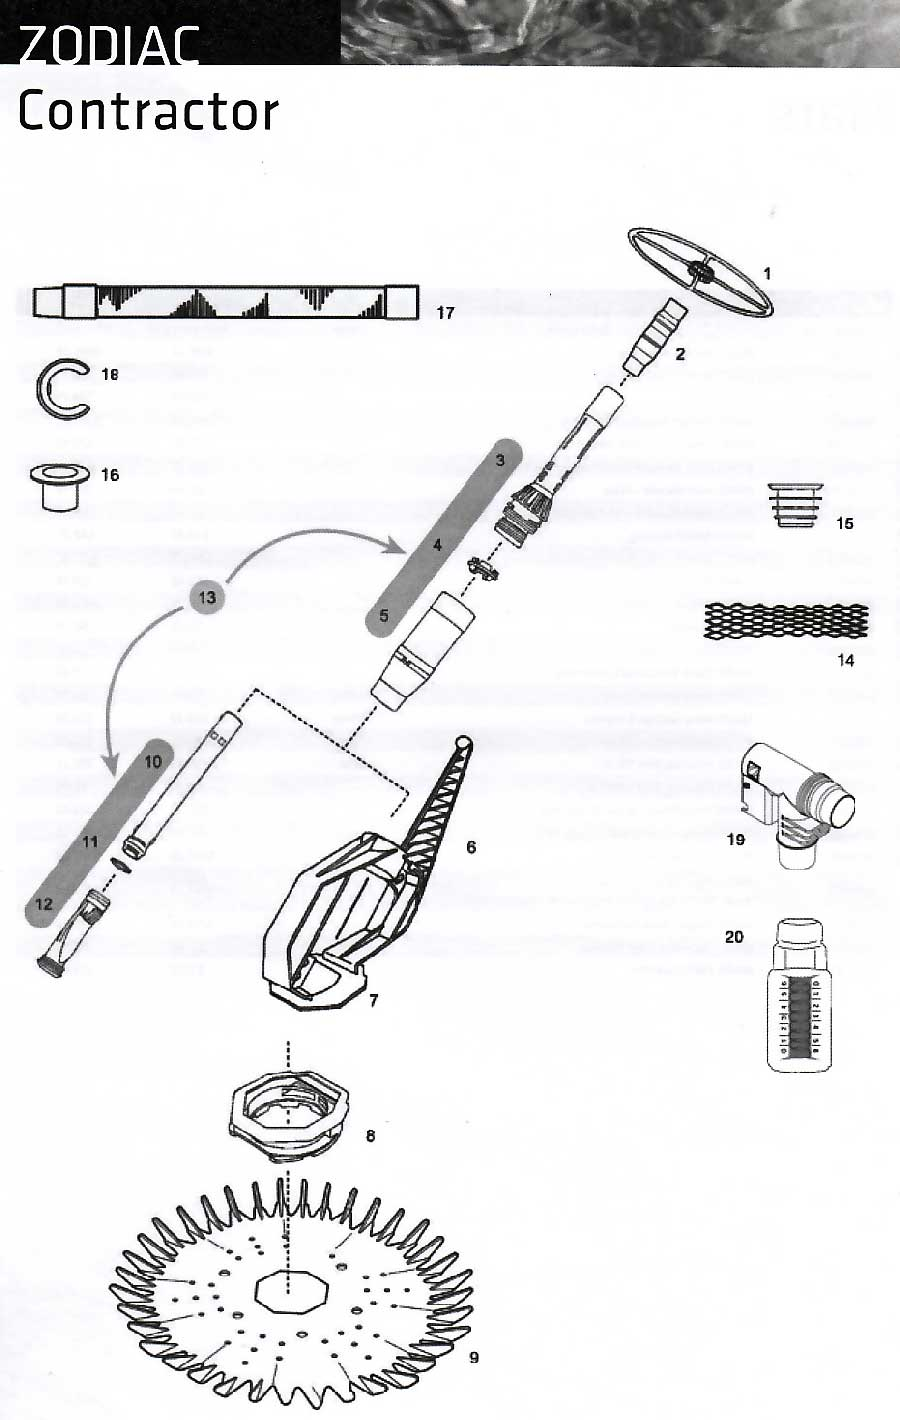 Zodiac Aquasphere Amp Contractor Spare Parts